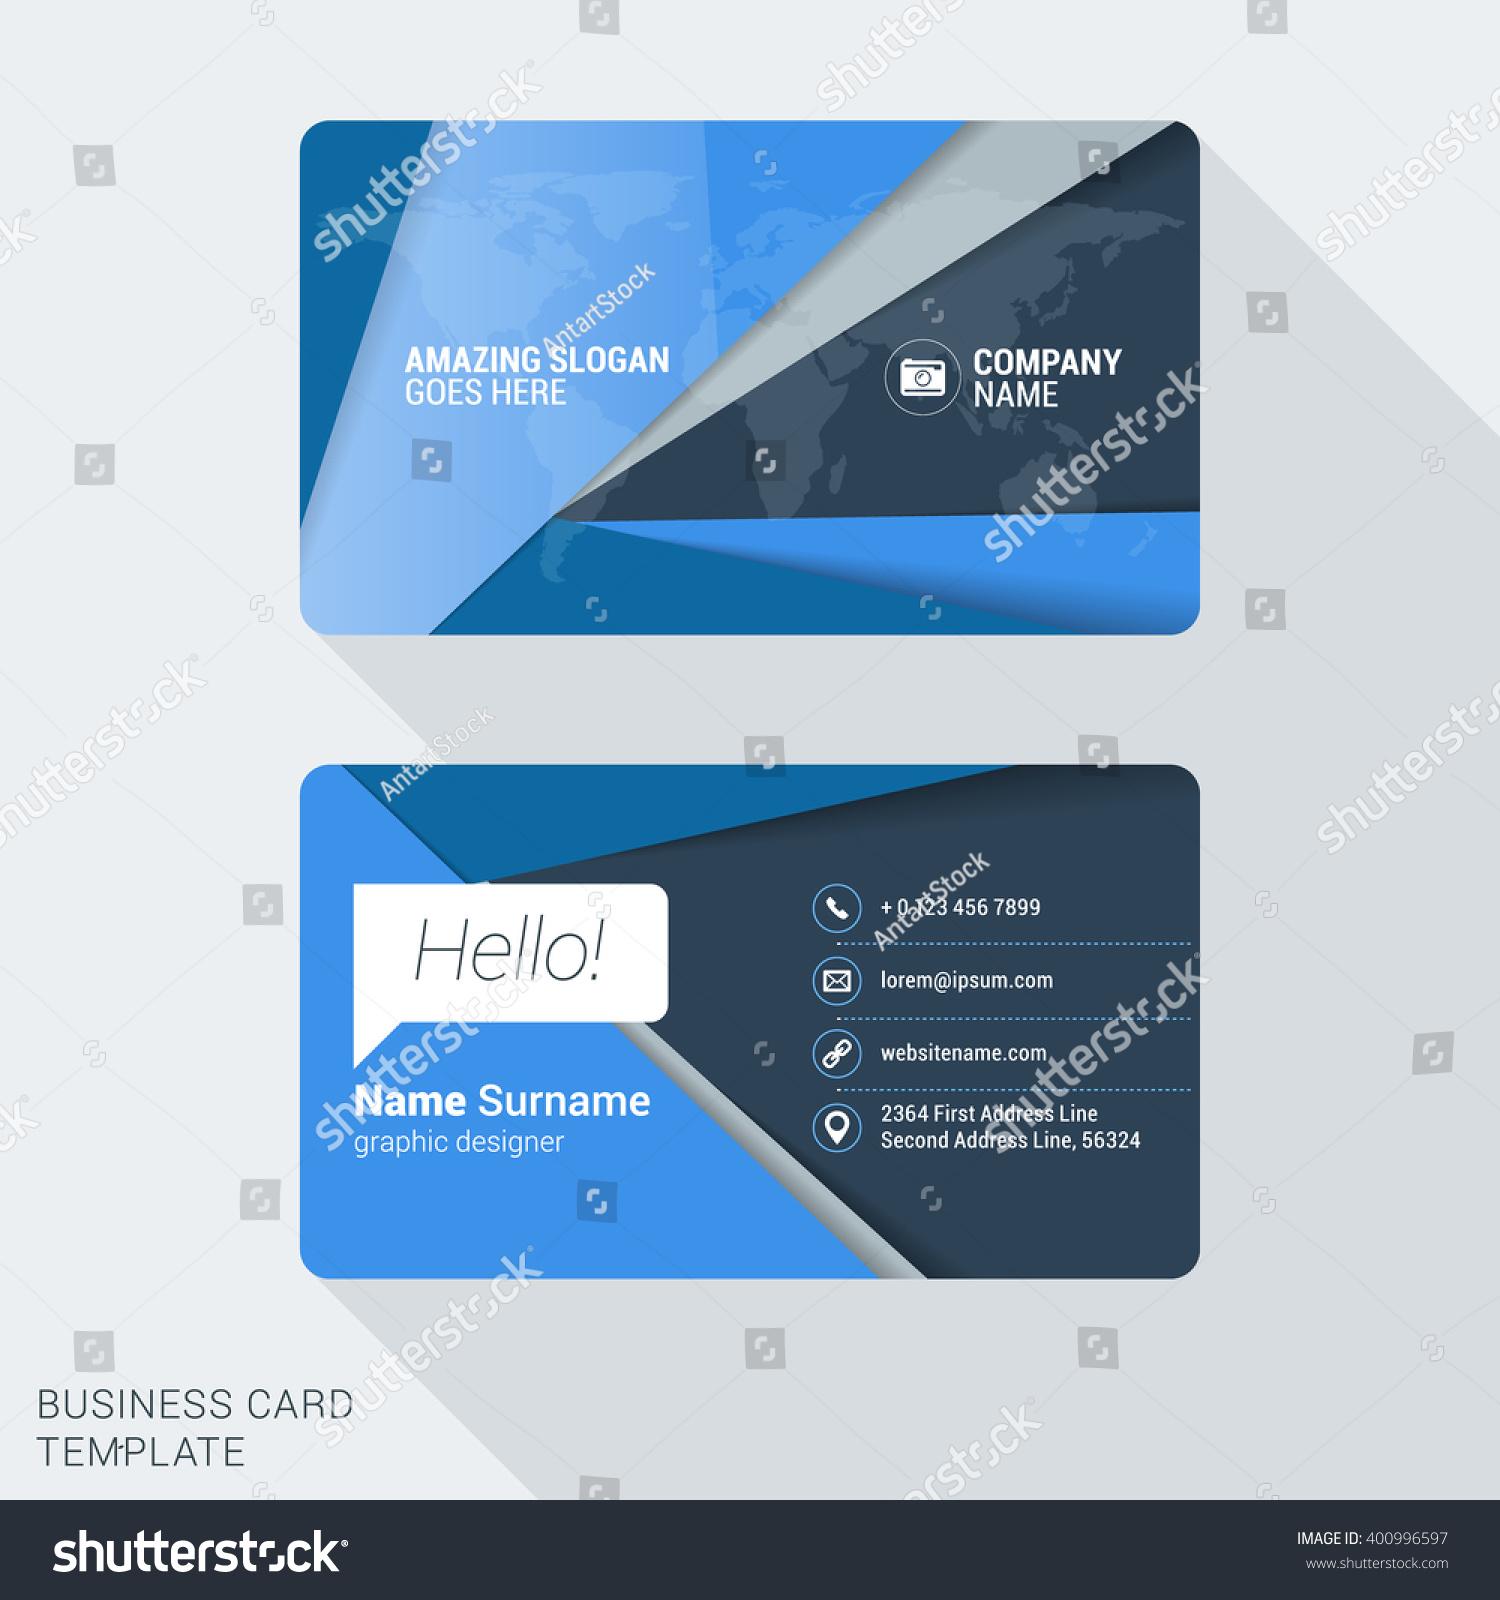 Modern Creative Business Card Template Flat Stock Vector 400996597 ...